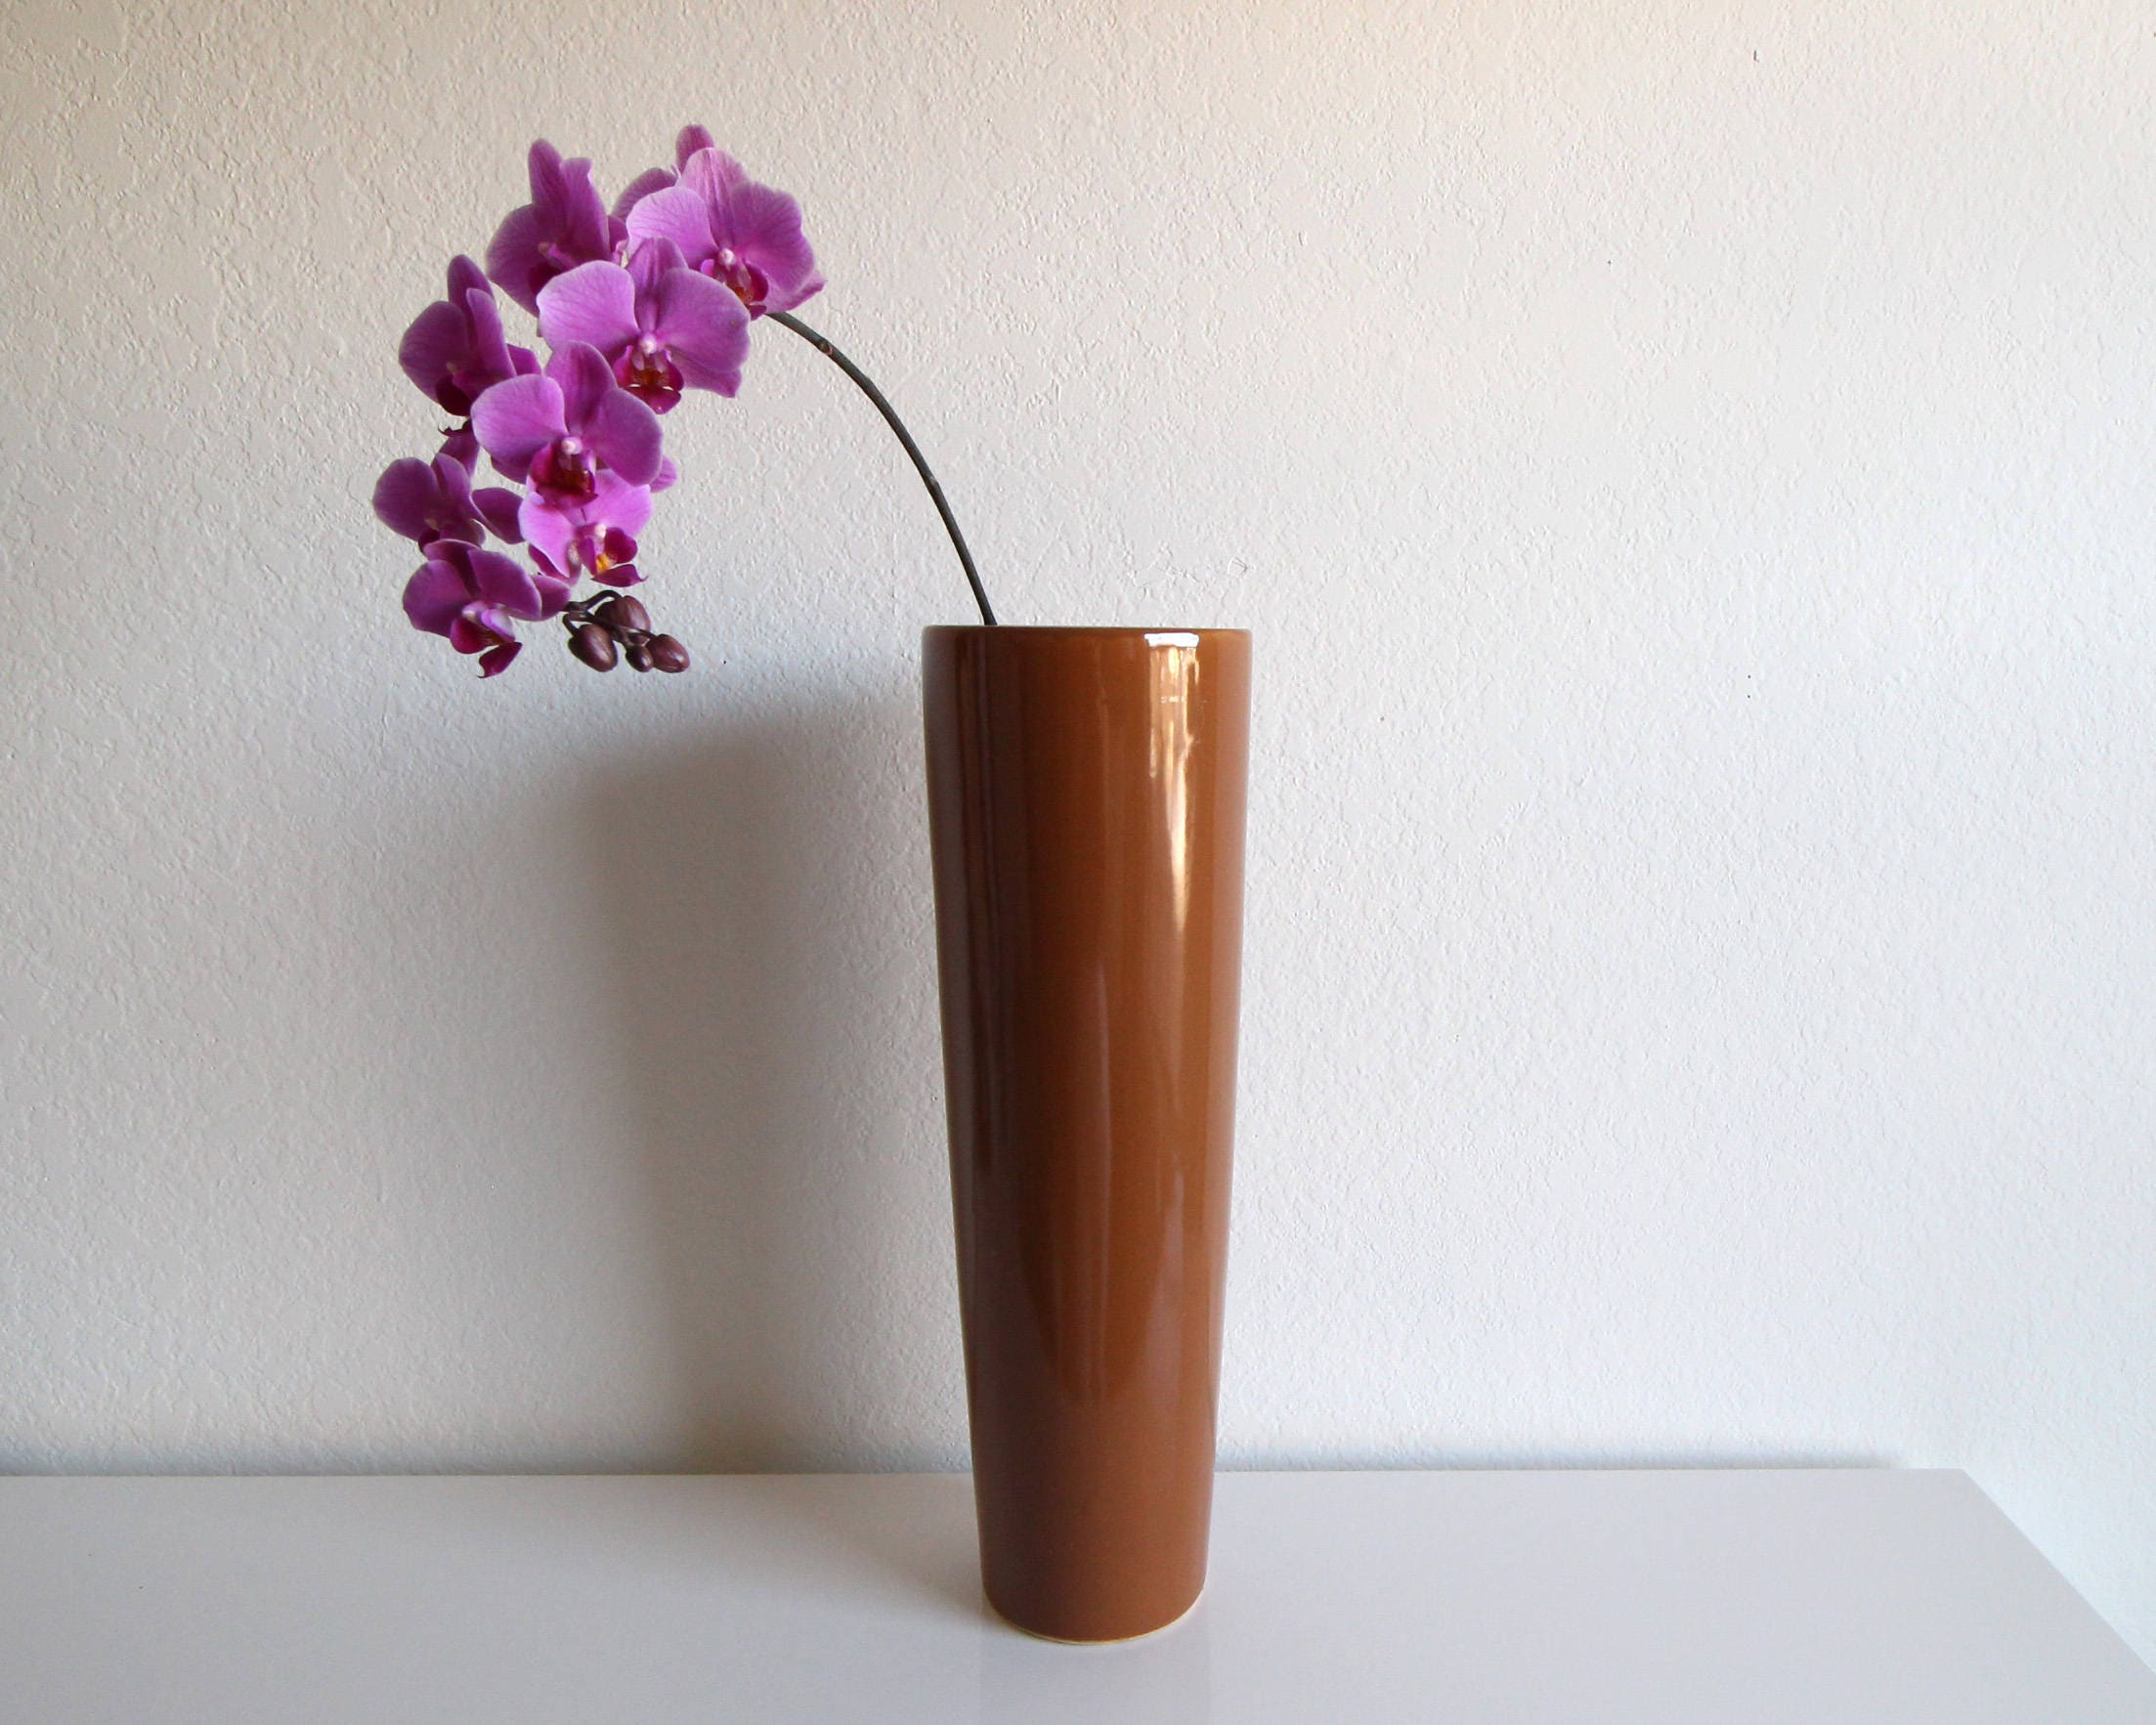 Vintage vase tall large 1980s caramel brown ceramic floor vase reviewsmspy